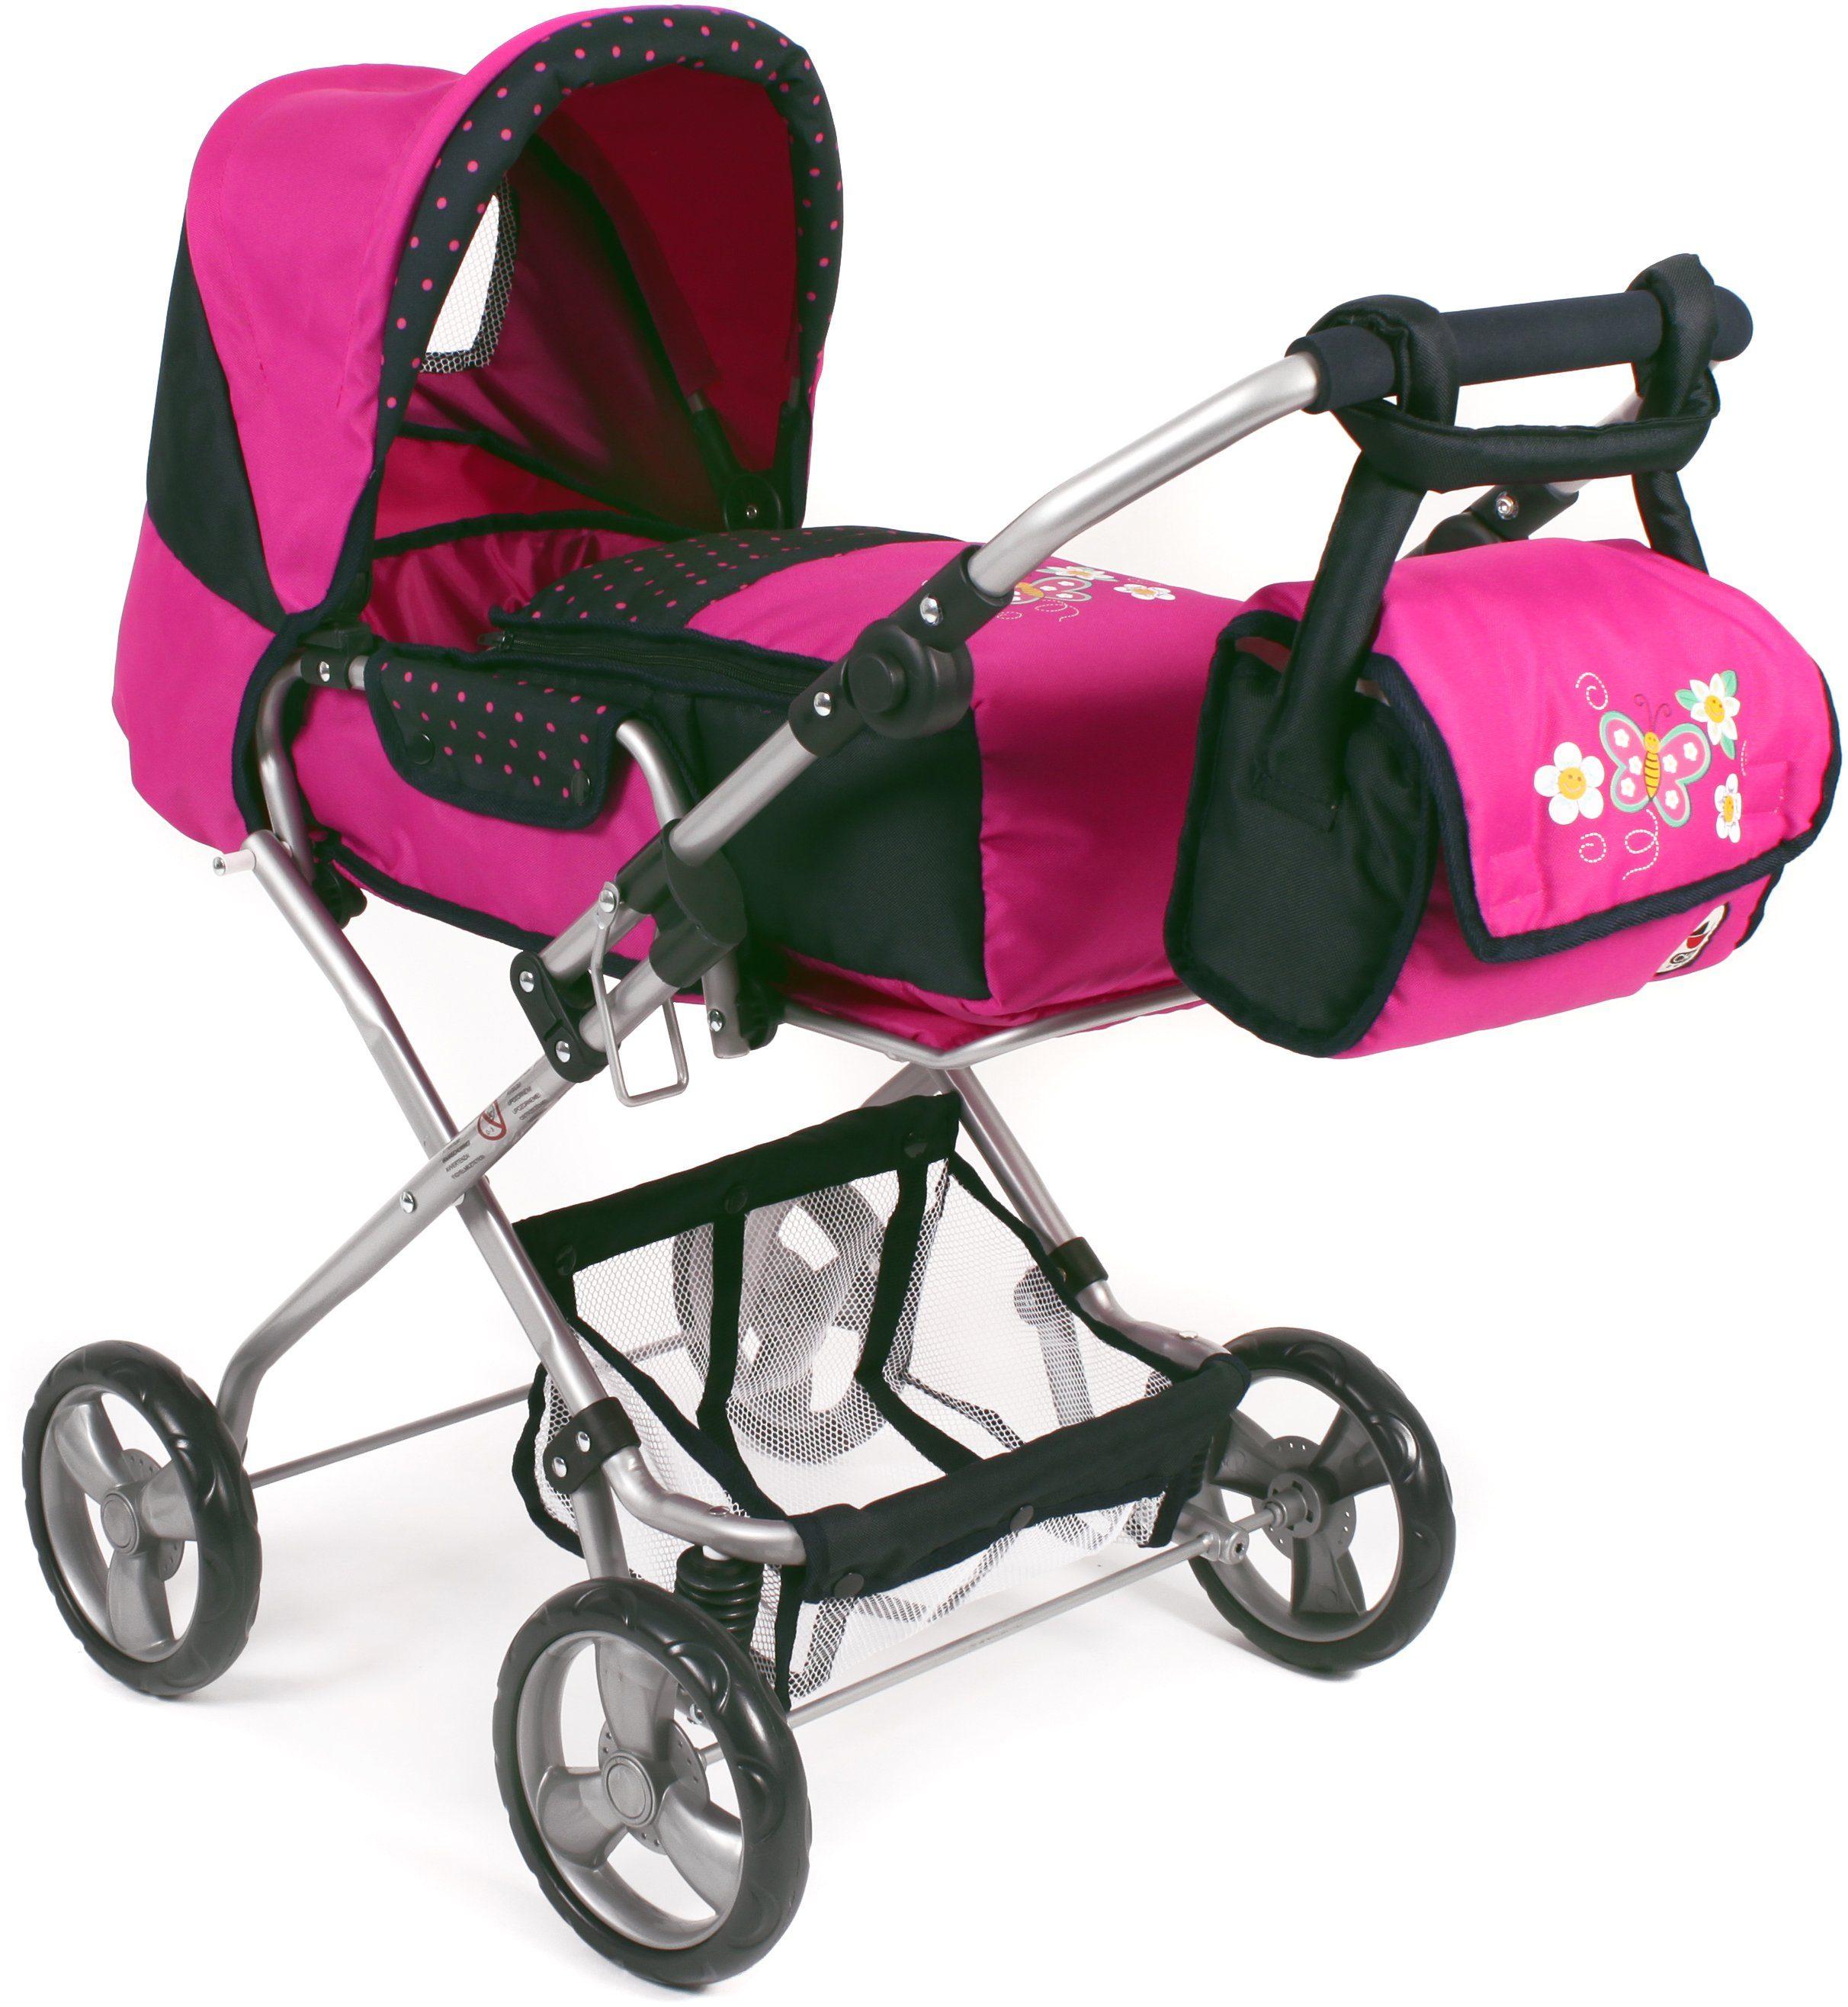 CHIC2000 Kombi Puppenwagen mit herausnehmbarer Tragetasche, »BAMBINA navy-pink«